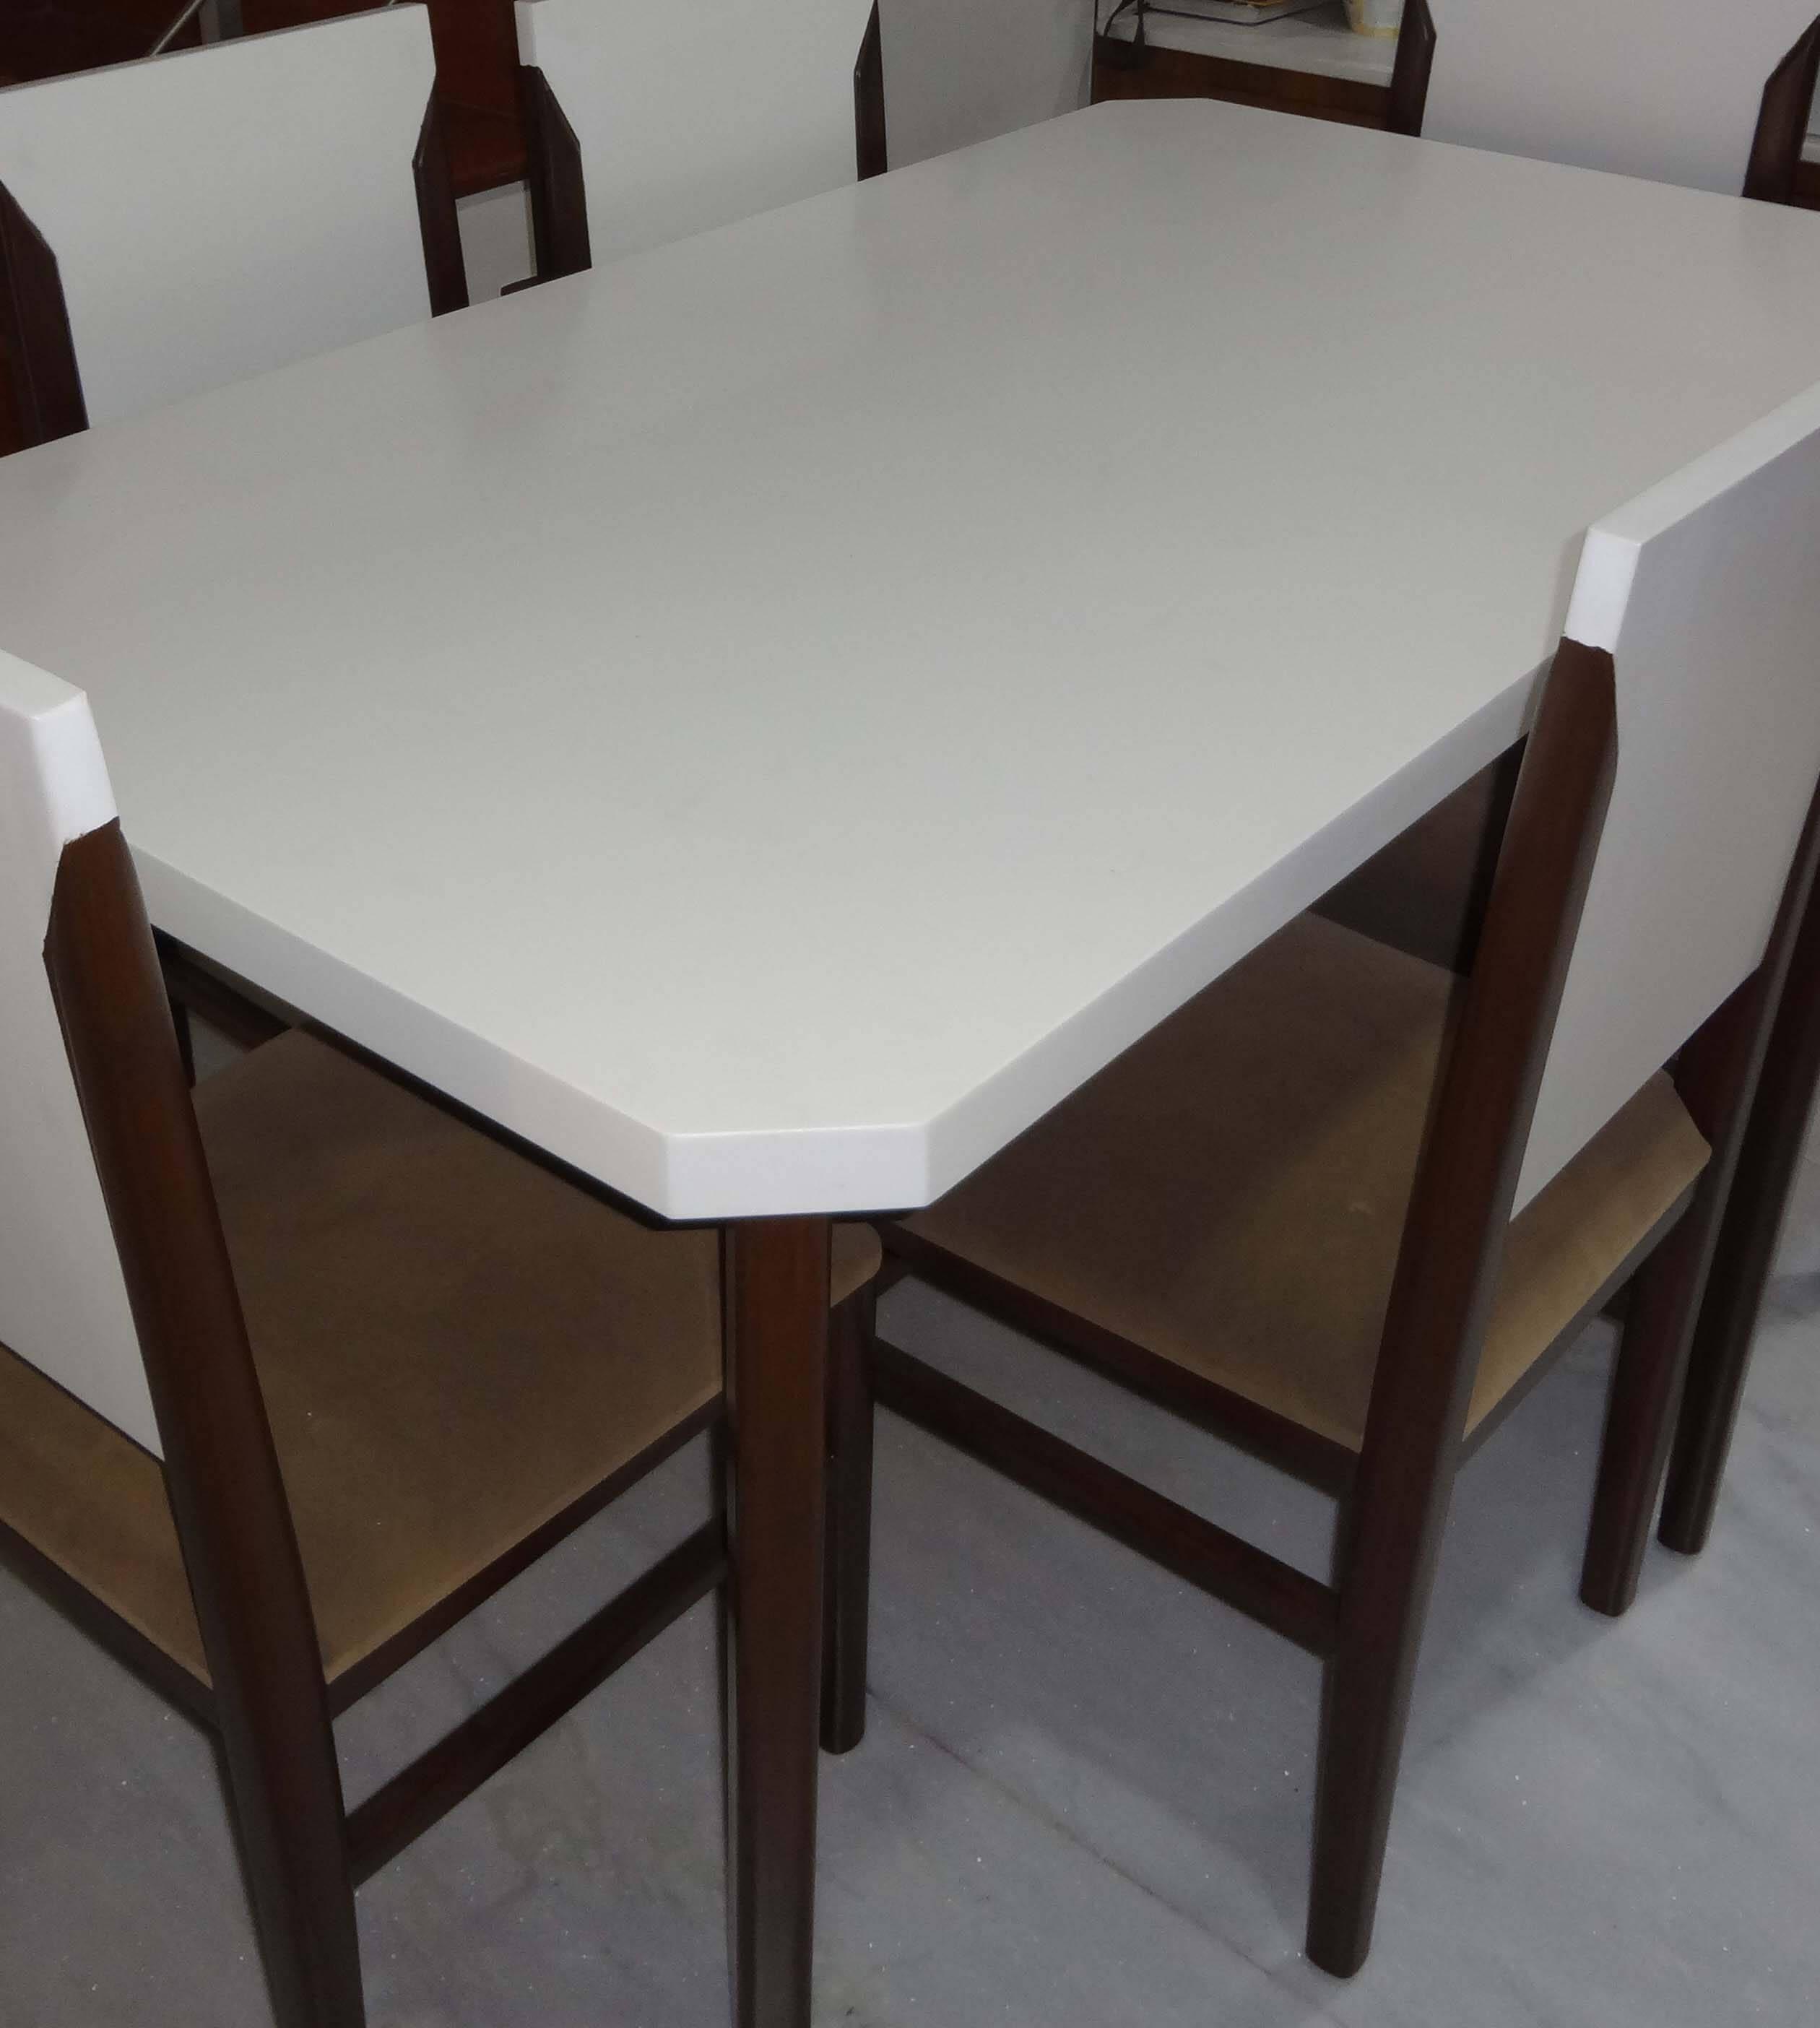 Dinning Table In Acrylic Uv Solid Surface Borisstone